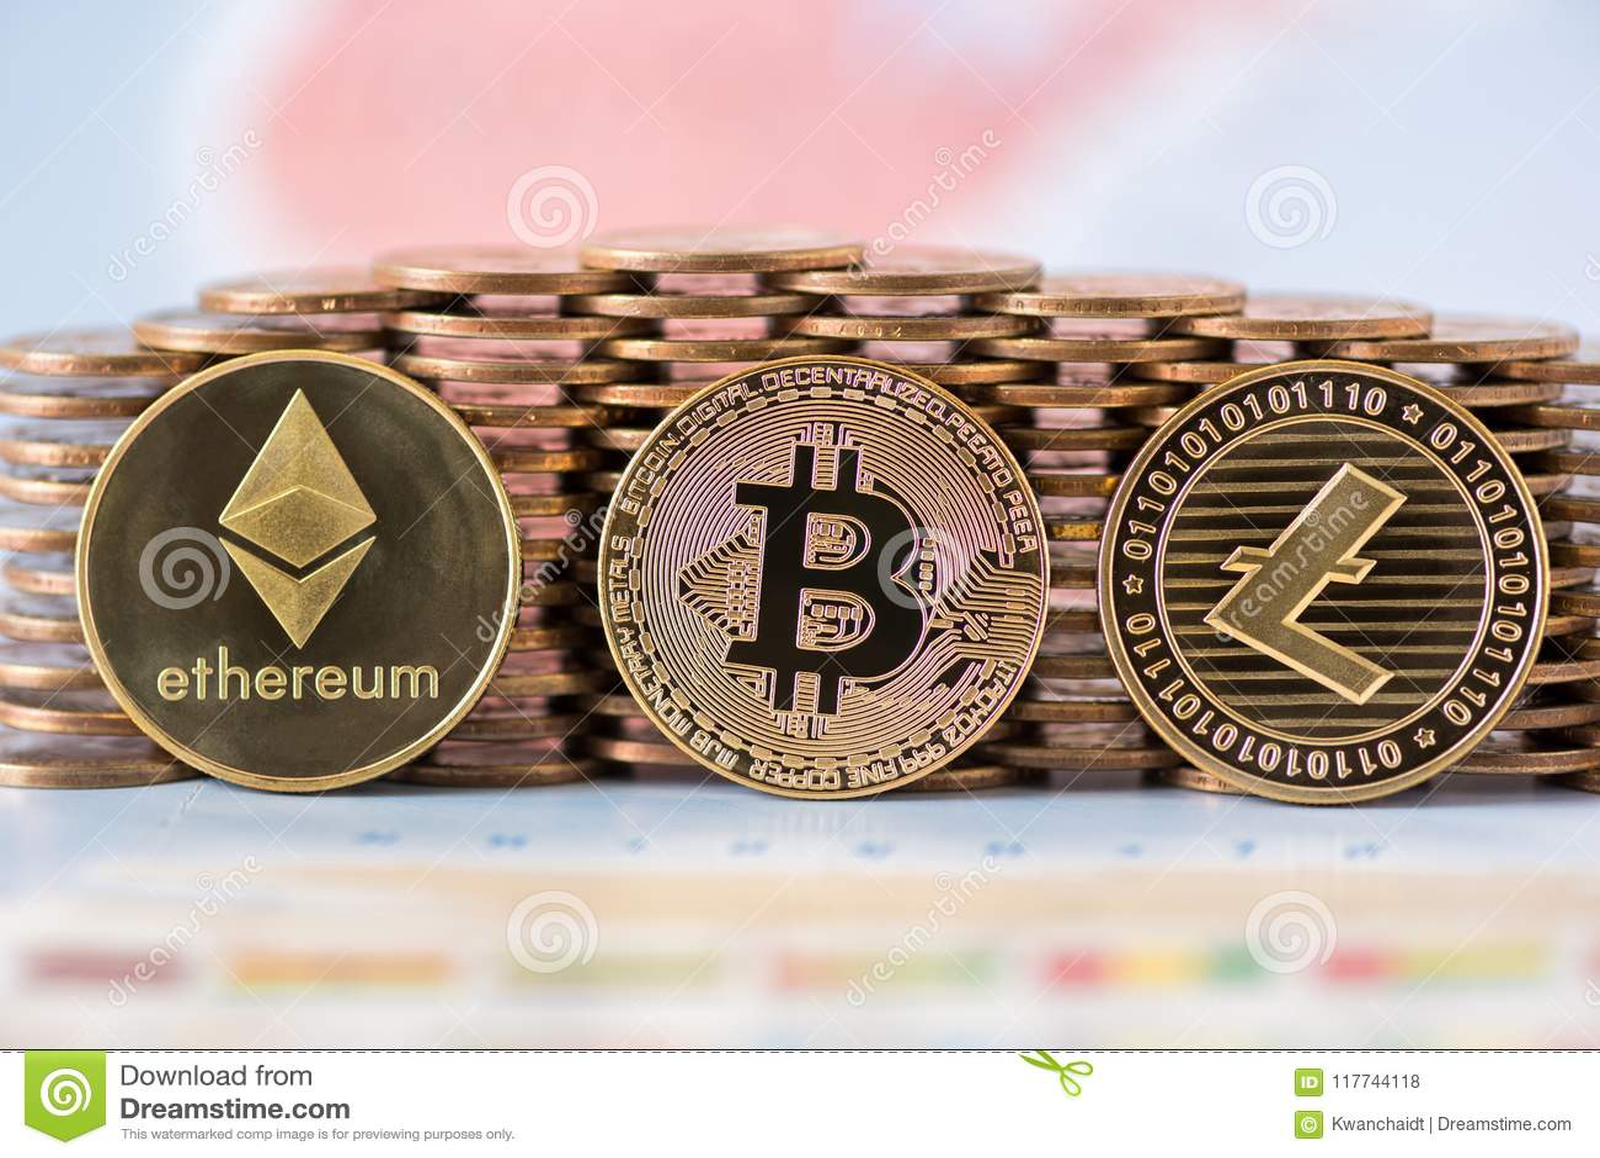 lite bitcoin cel mai fiabil schimb de bitcoin